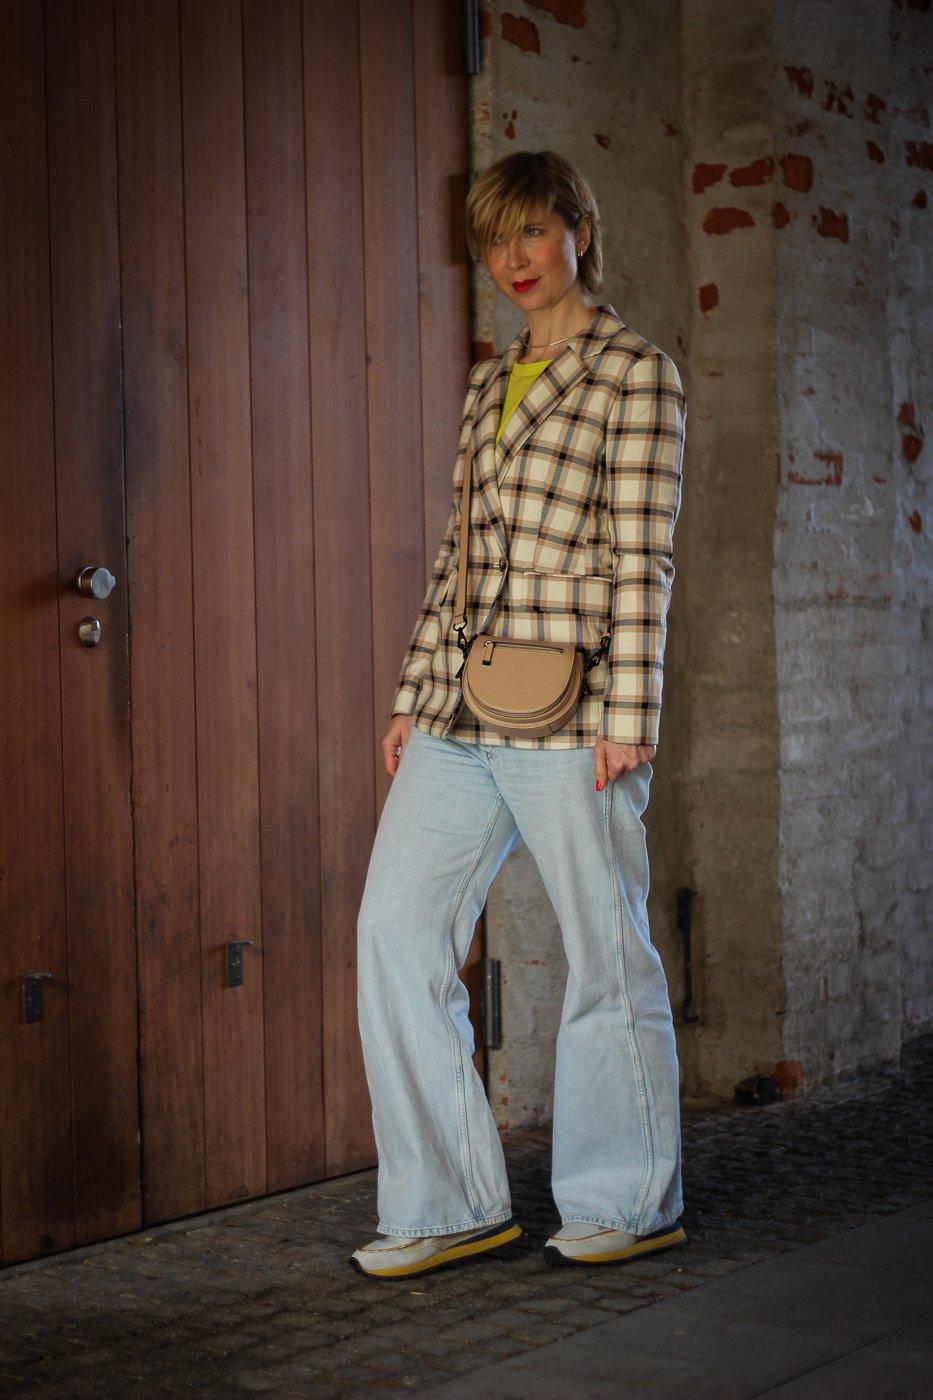 conny doll lifestyle: Frau mit Frühlingslook, gelber Pullover, Businesscasual, Gleichberechtigung, Karoblazer